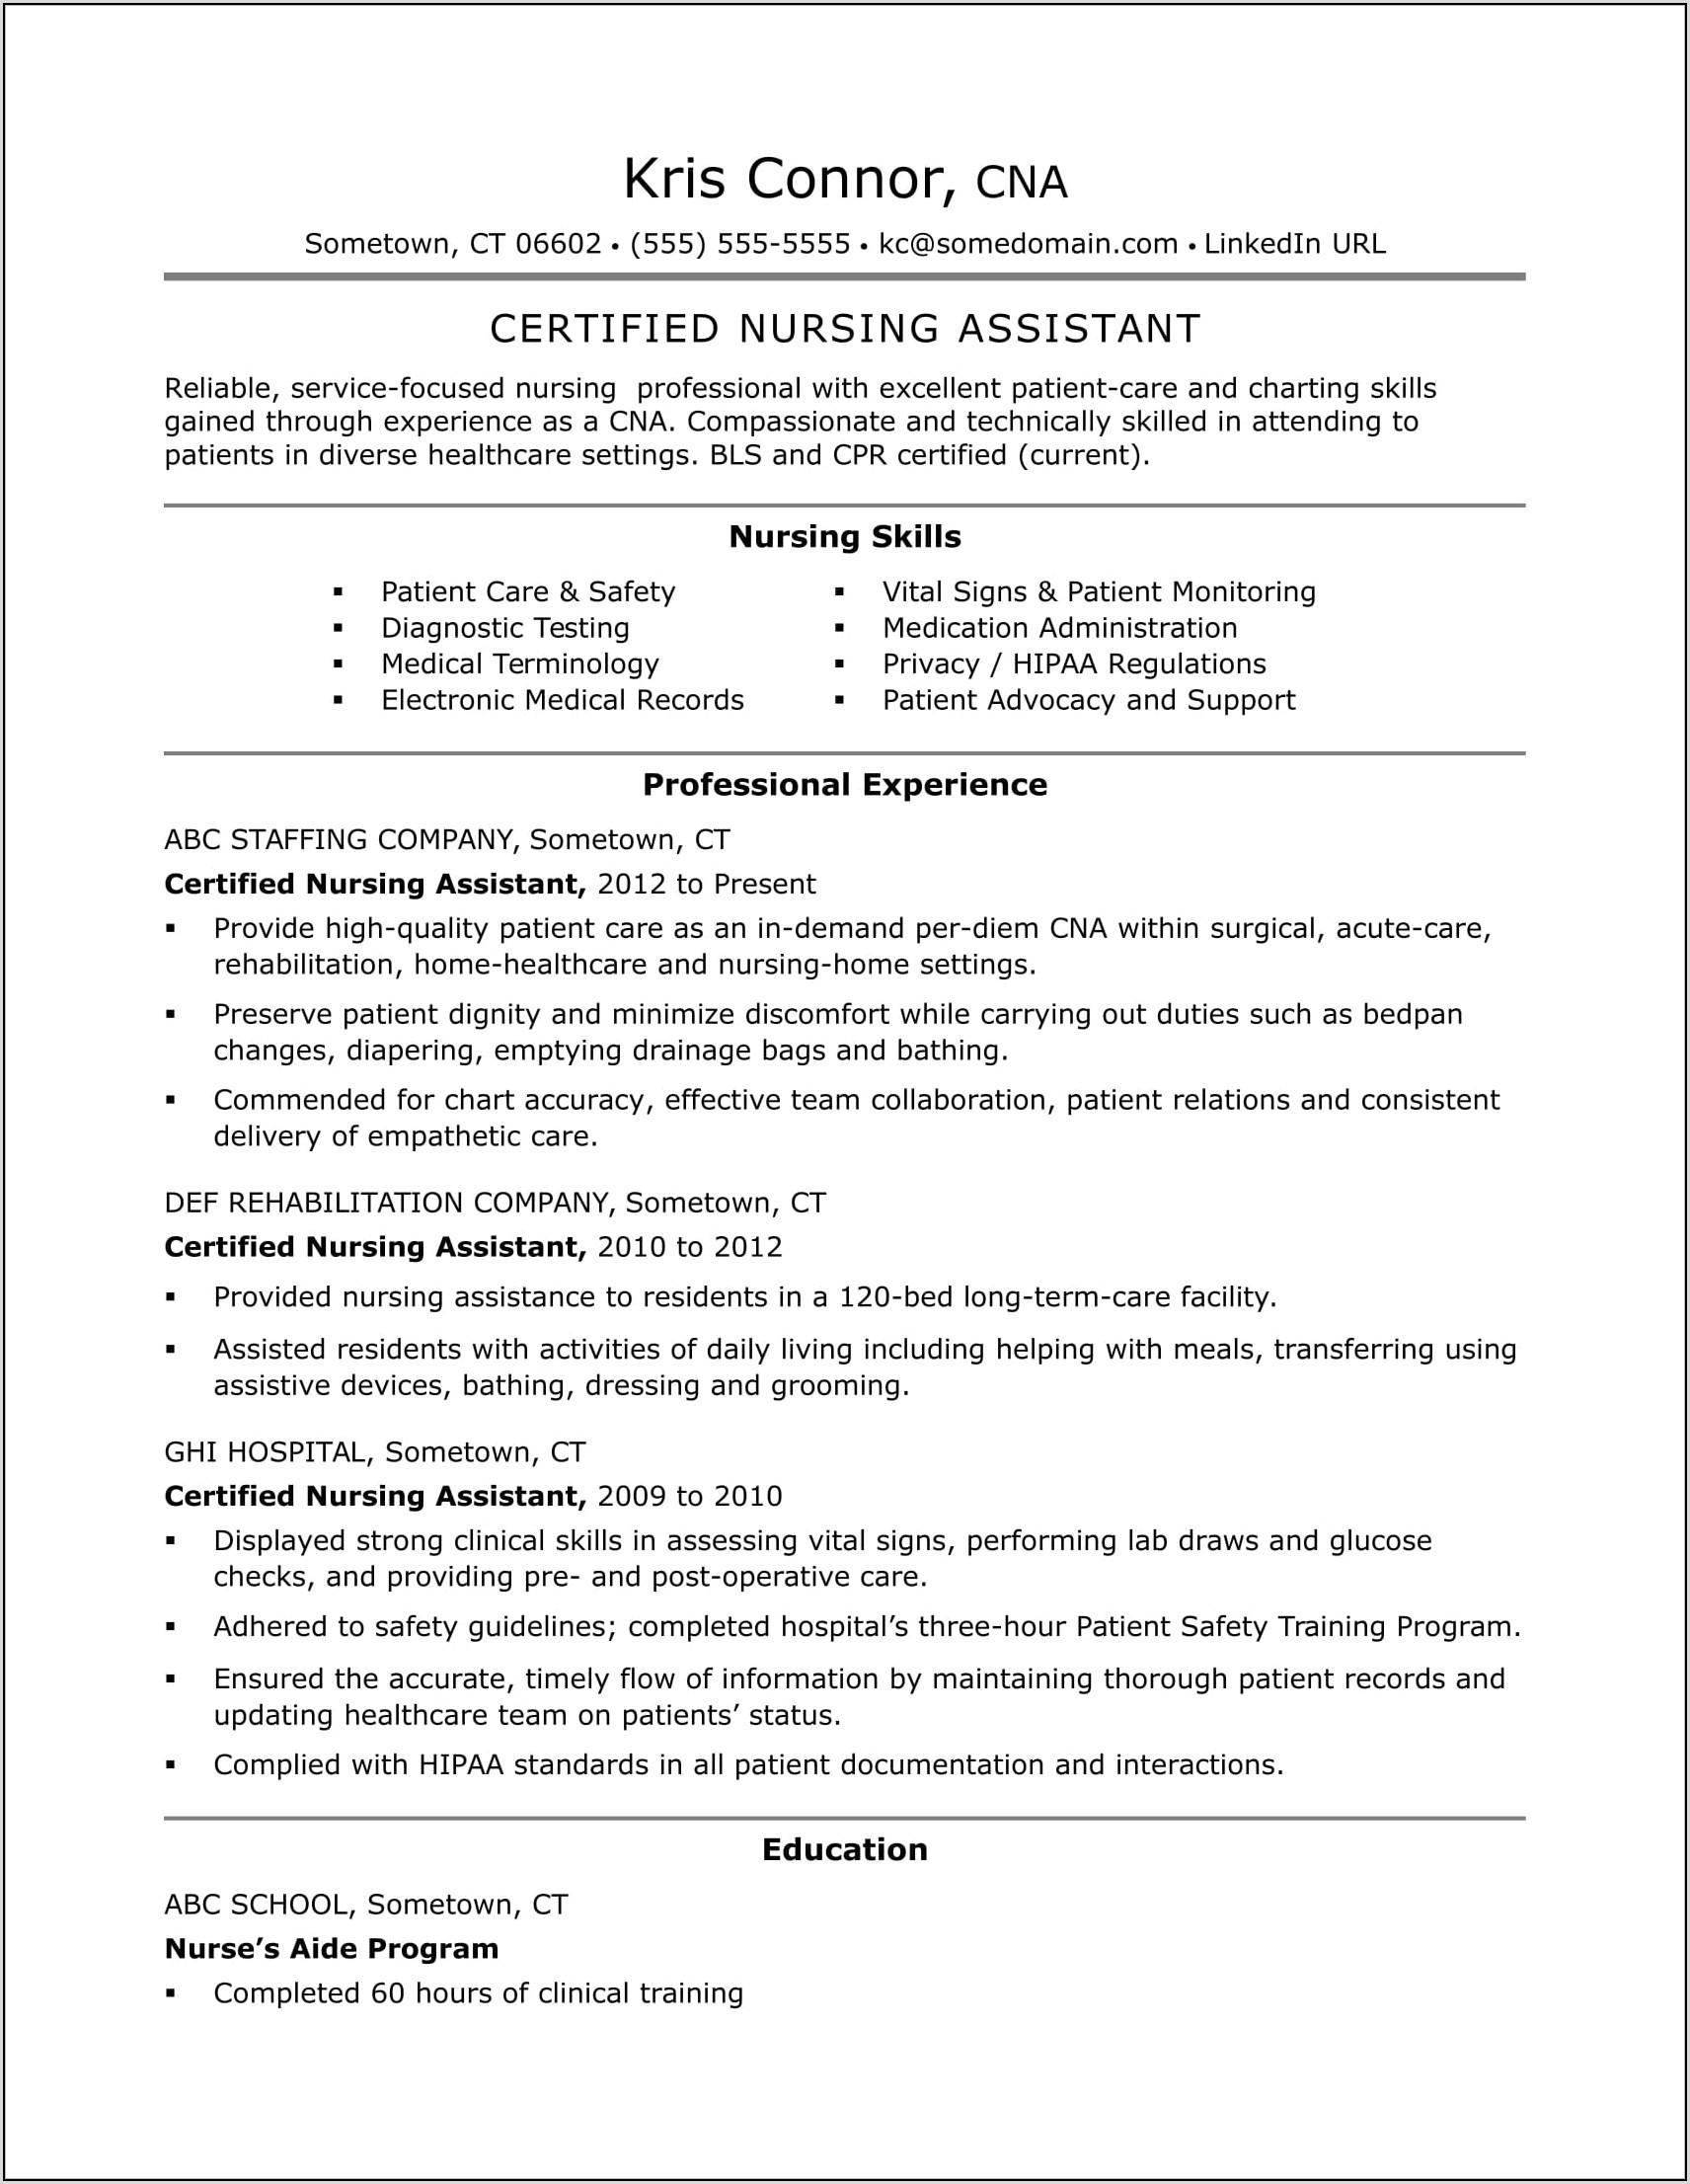 Resume Templates For Cnas Free